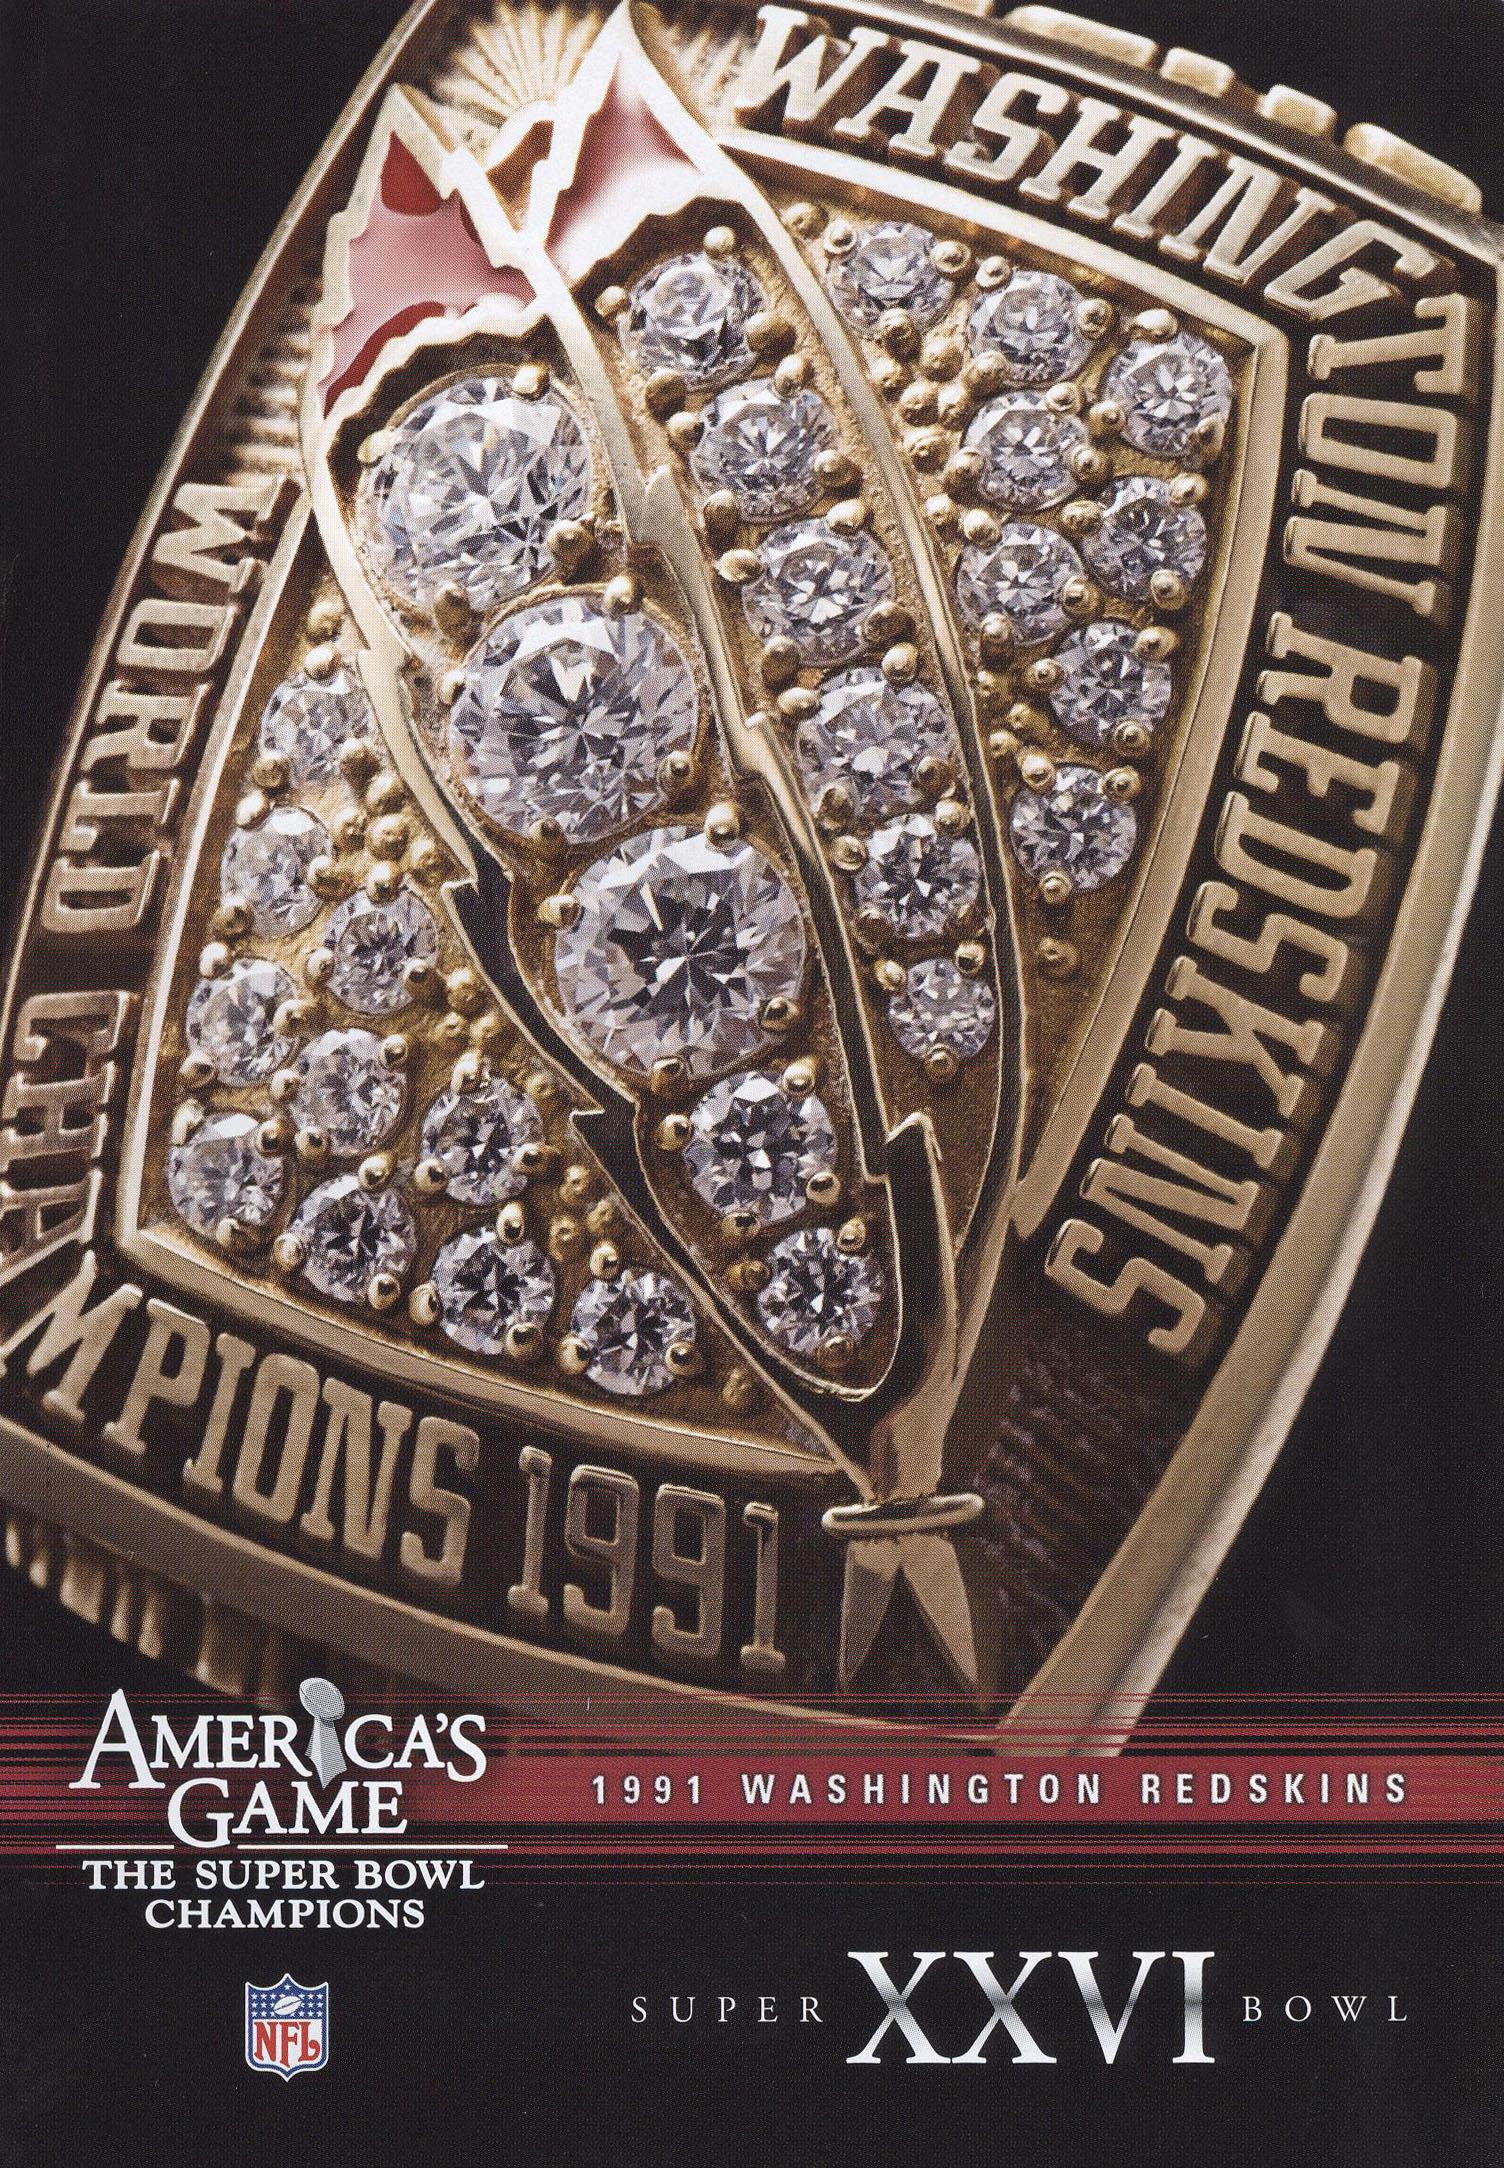 NFL: America's Game - 1991 Washington Redskins - Super Bowl XXVI